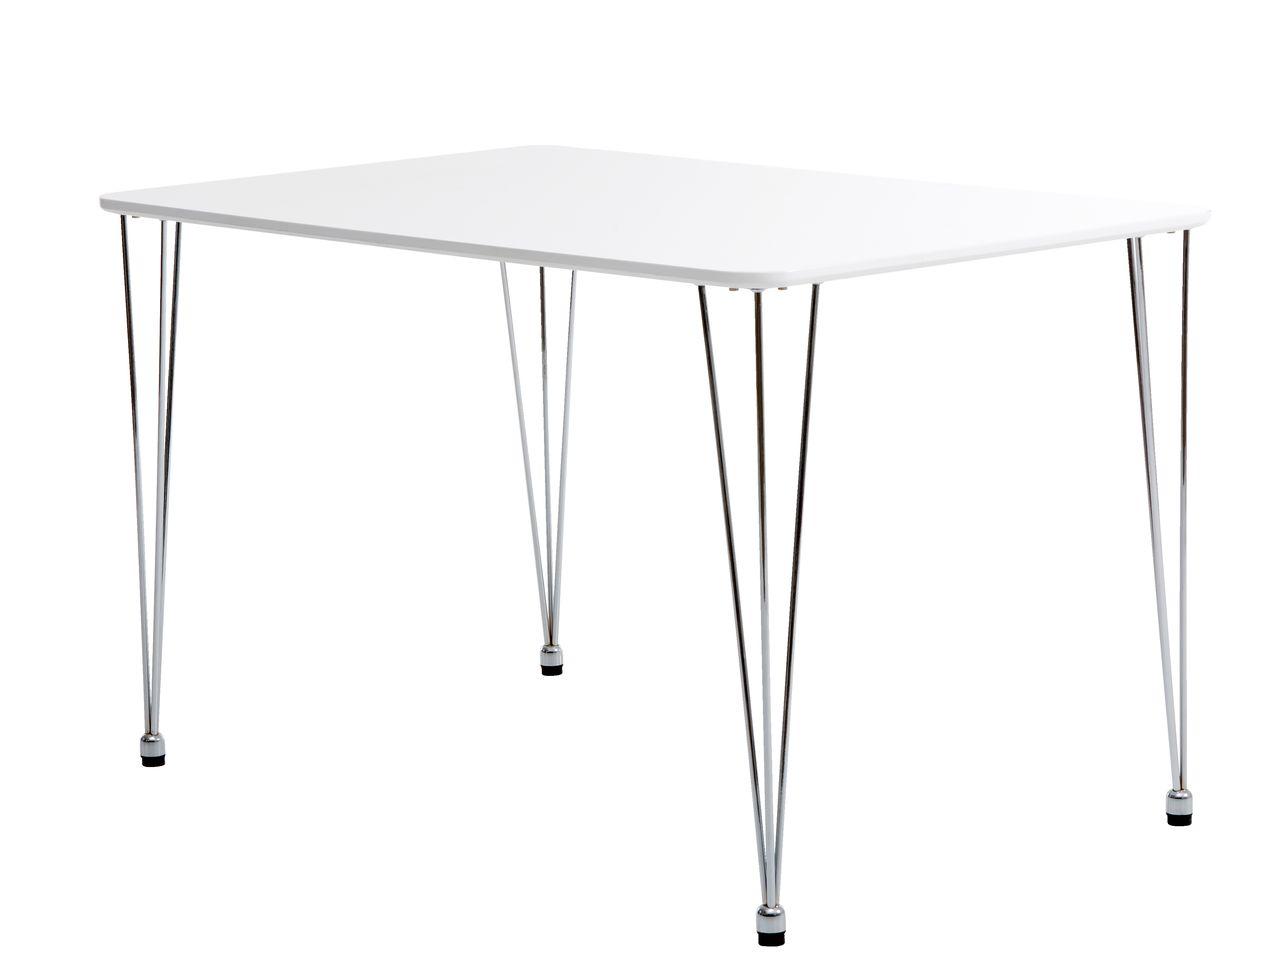 jysk bord Spisebord BANNERUP 76x120 hvid/krom | JYSK jysk bord